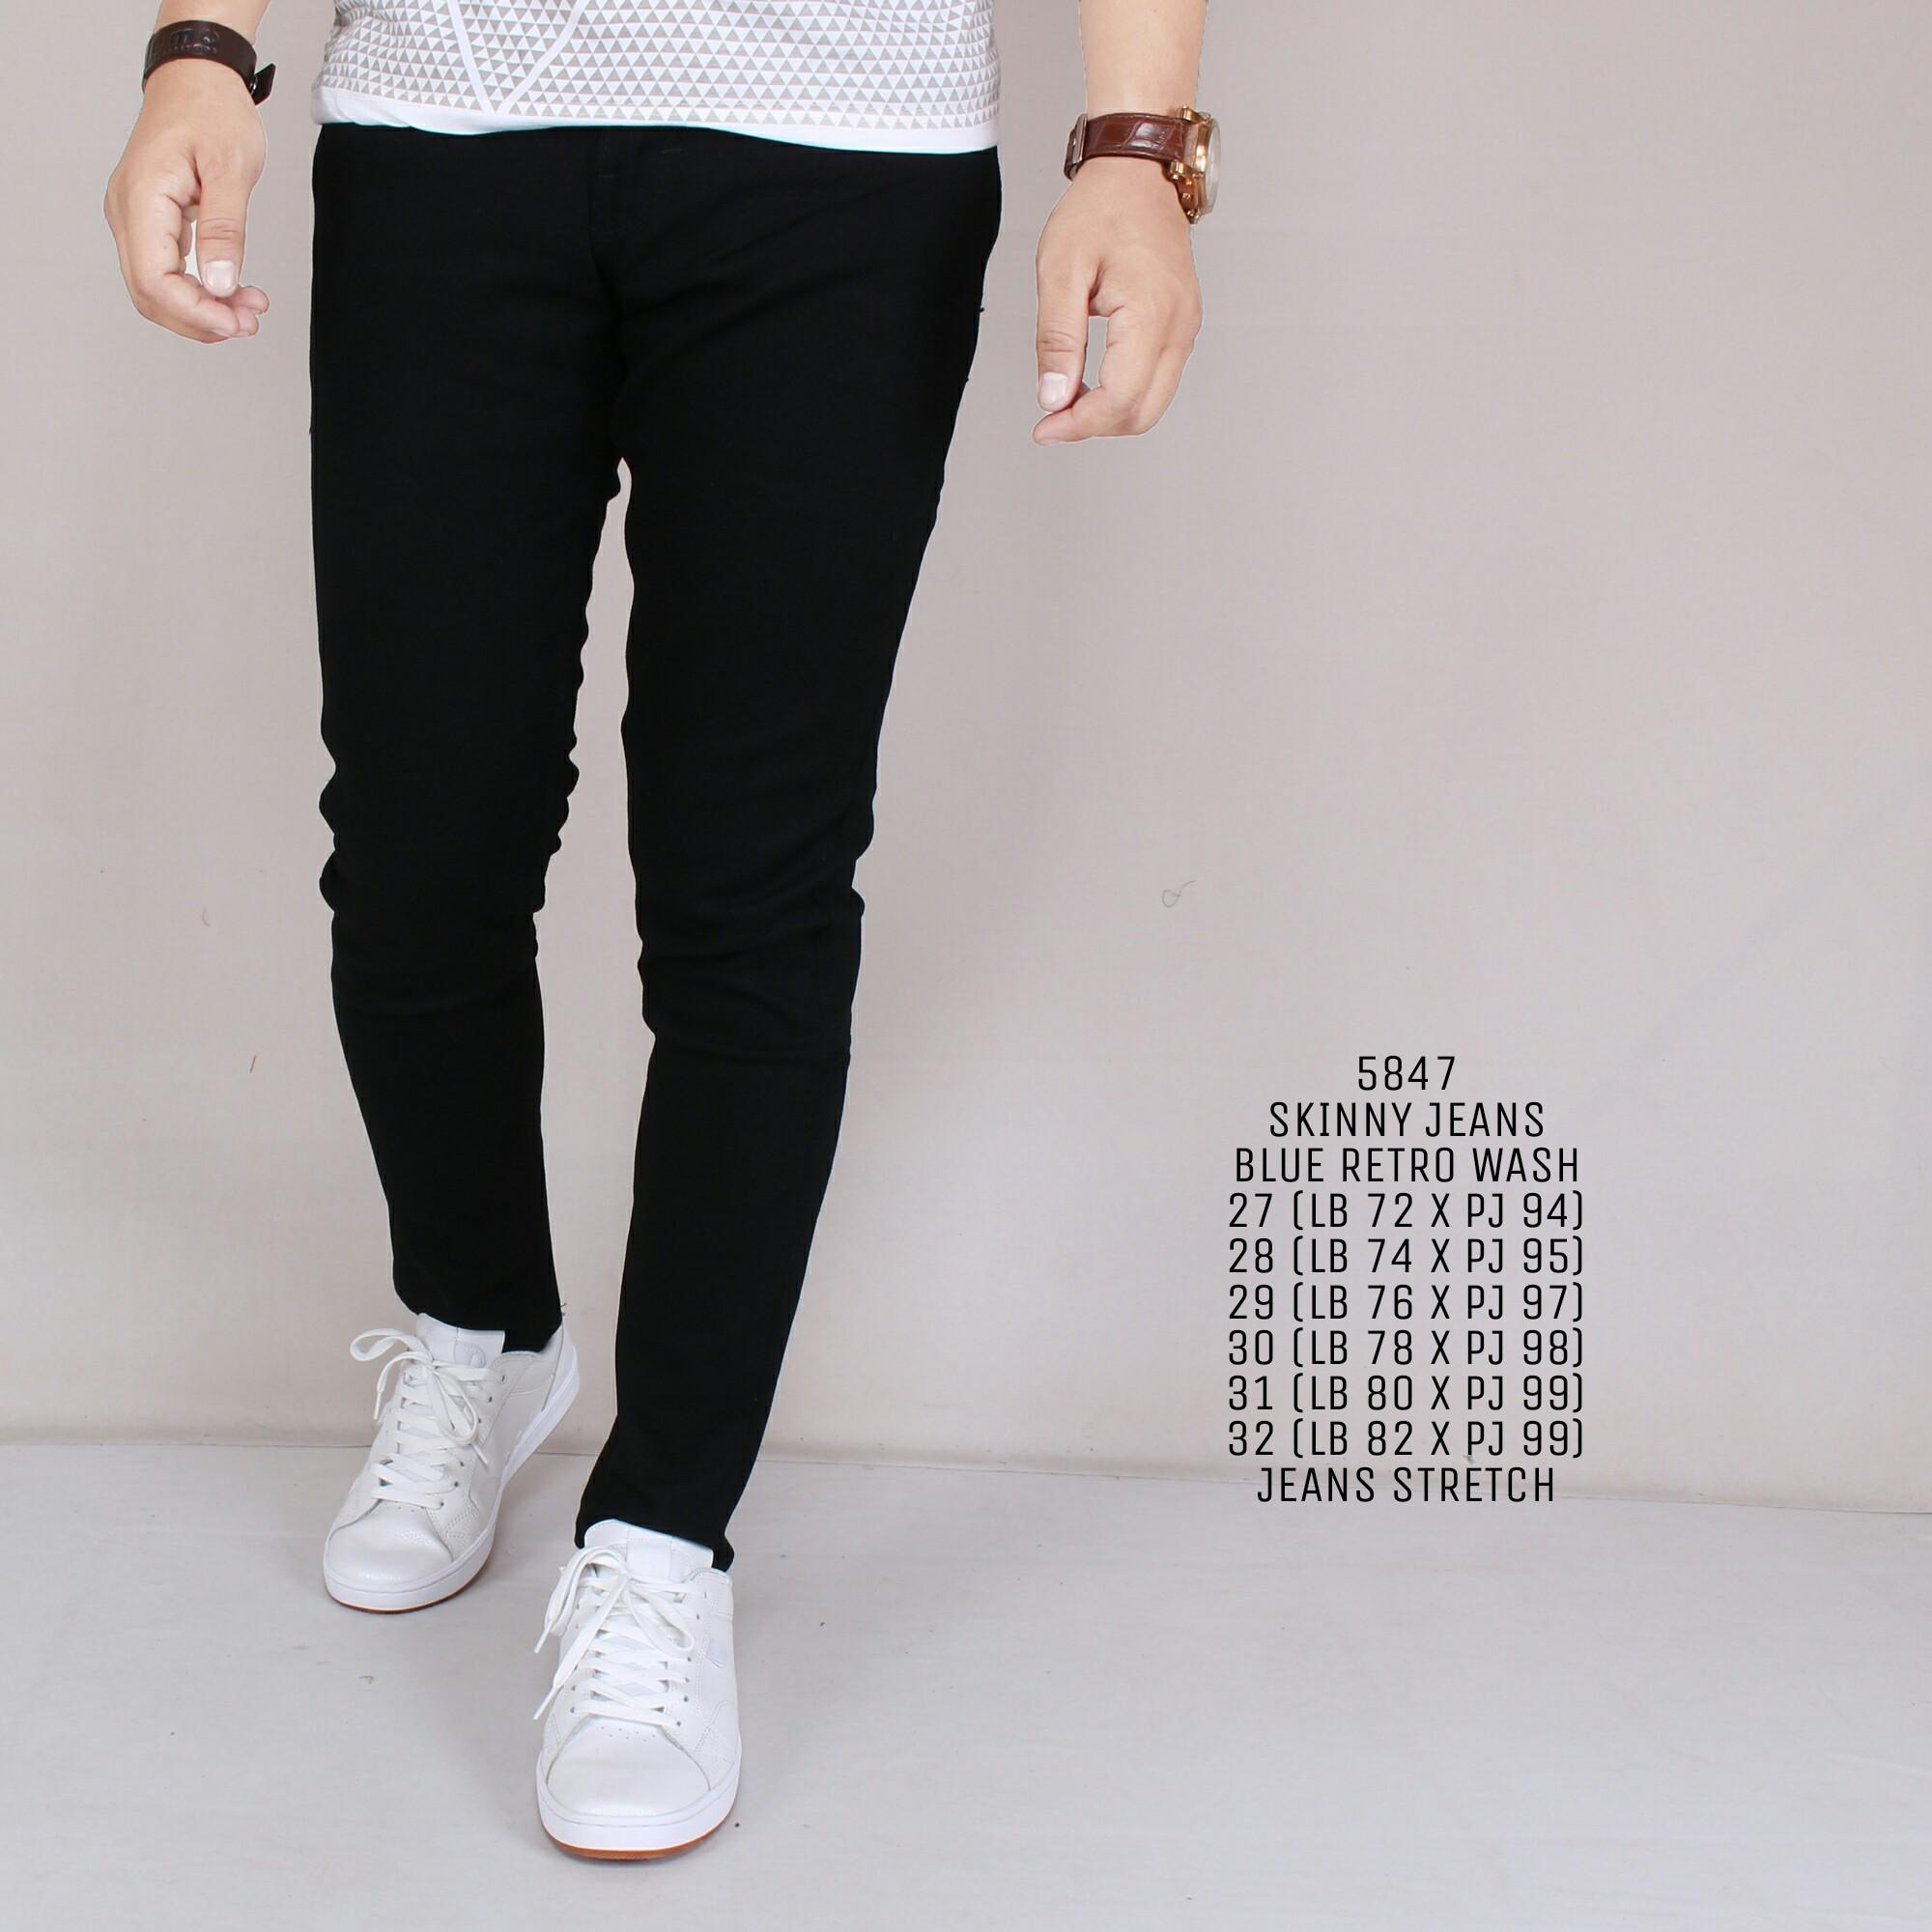 Zoeystore Celena Jeans Panjang Pria Celana Jeans Skinny Cowok Washing Black Cut Rips Celana Jeans Slimfit Denim 5847